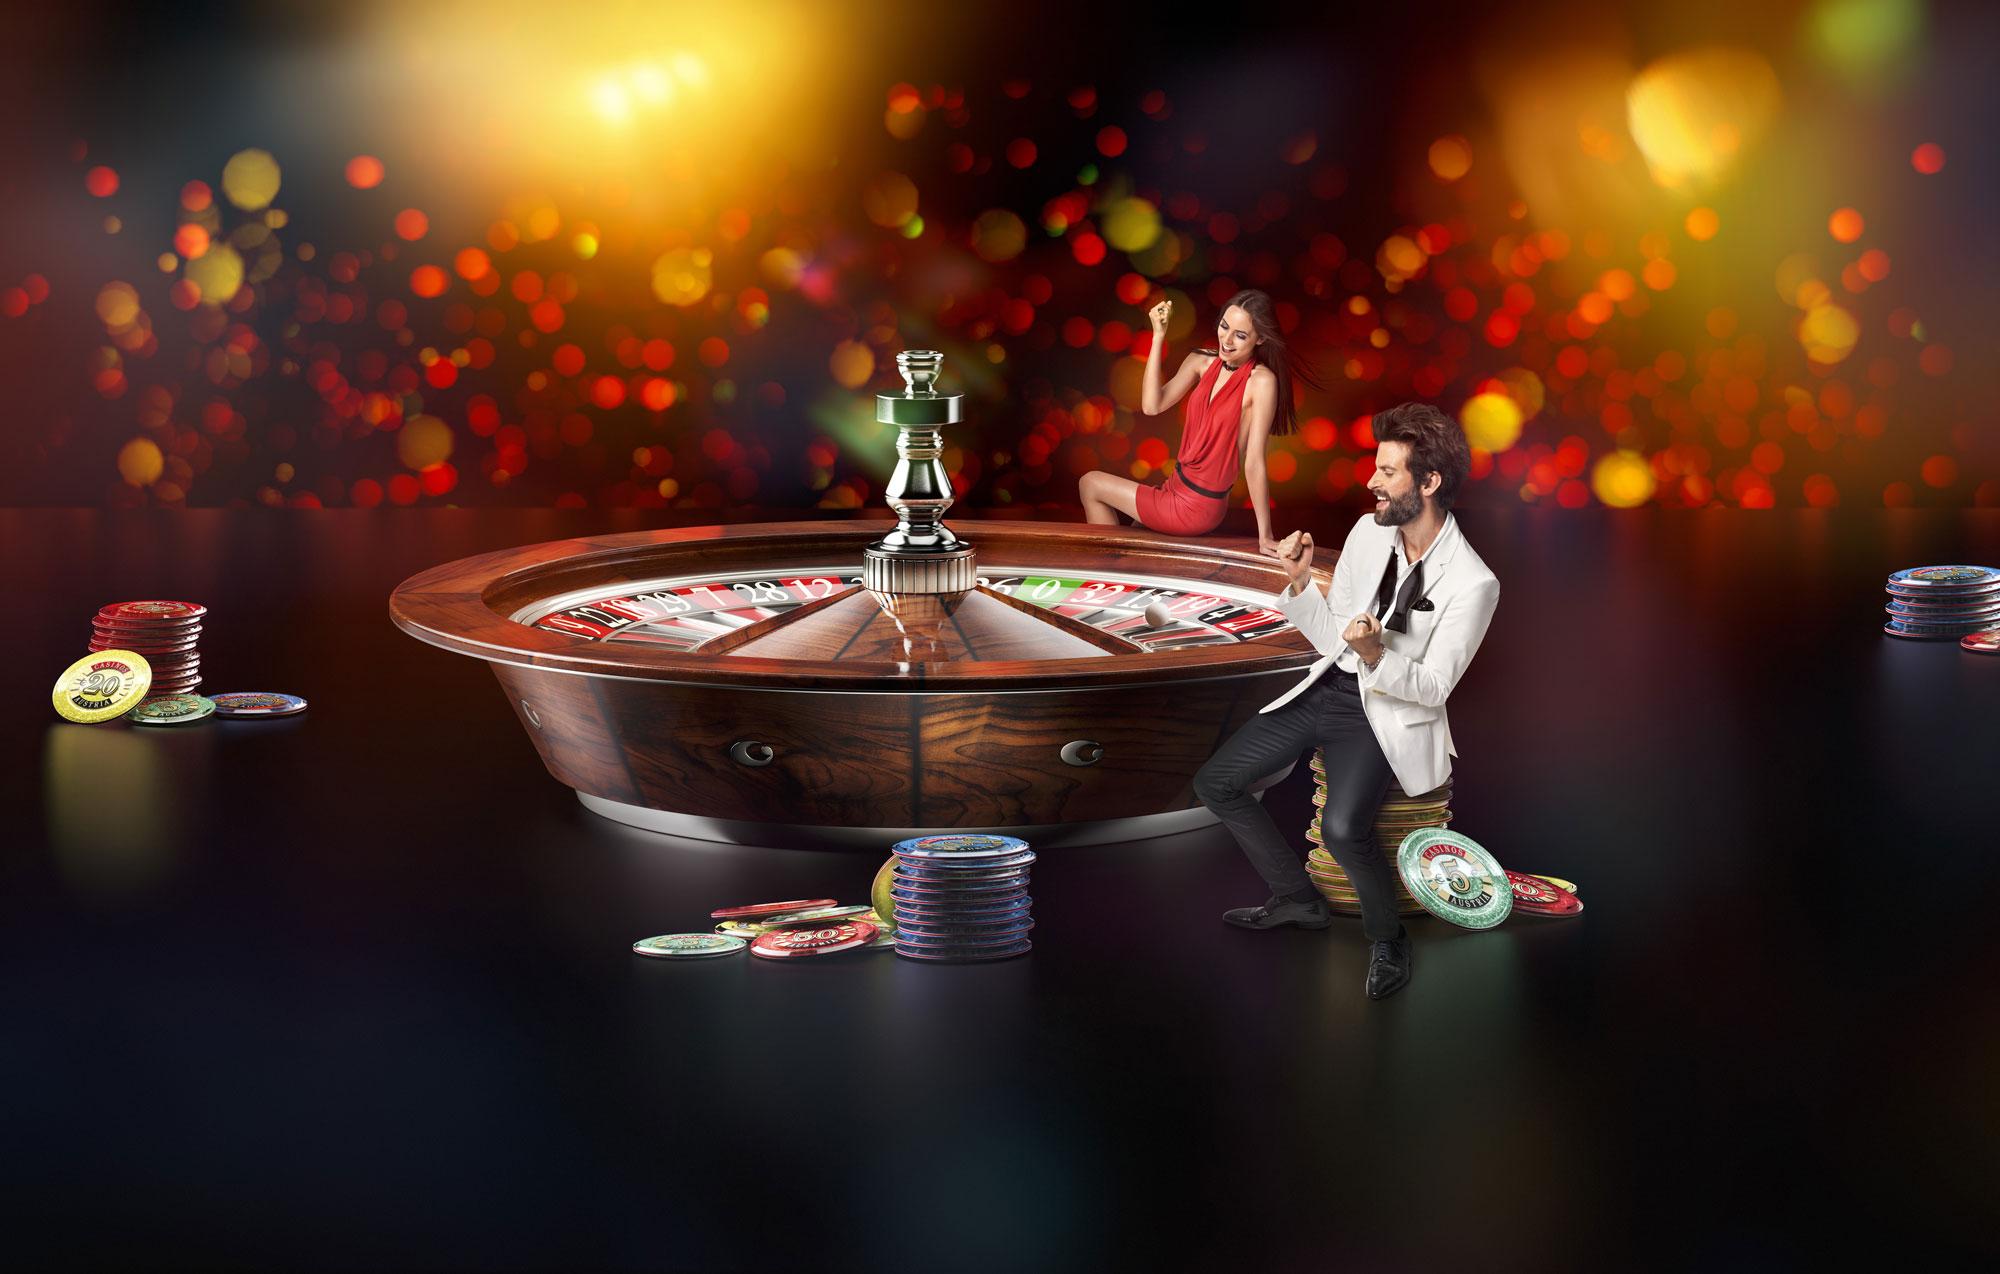 Améliorer sa performance avec academie poker liegeois